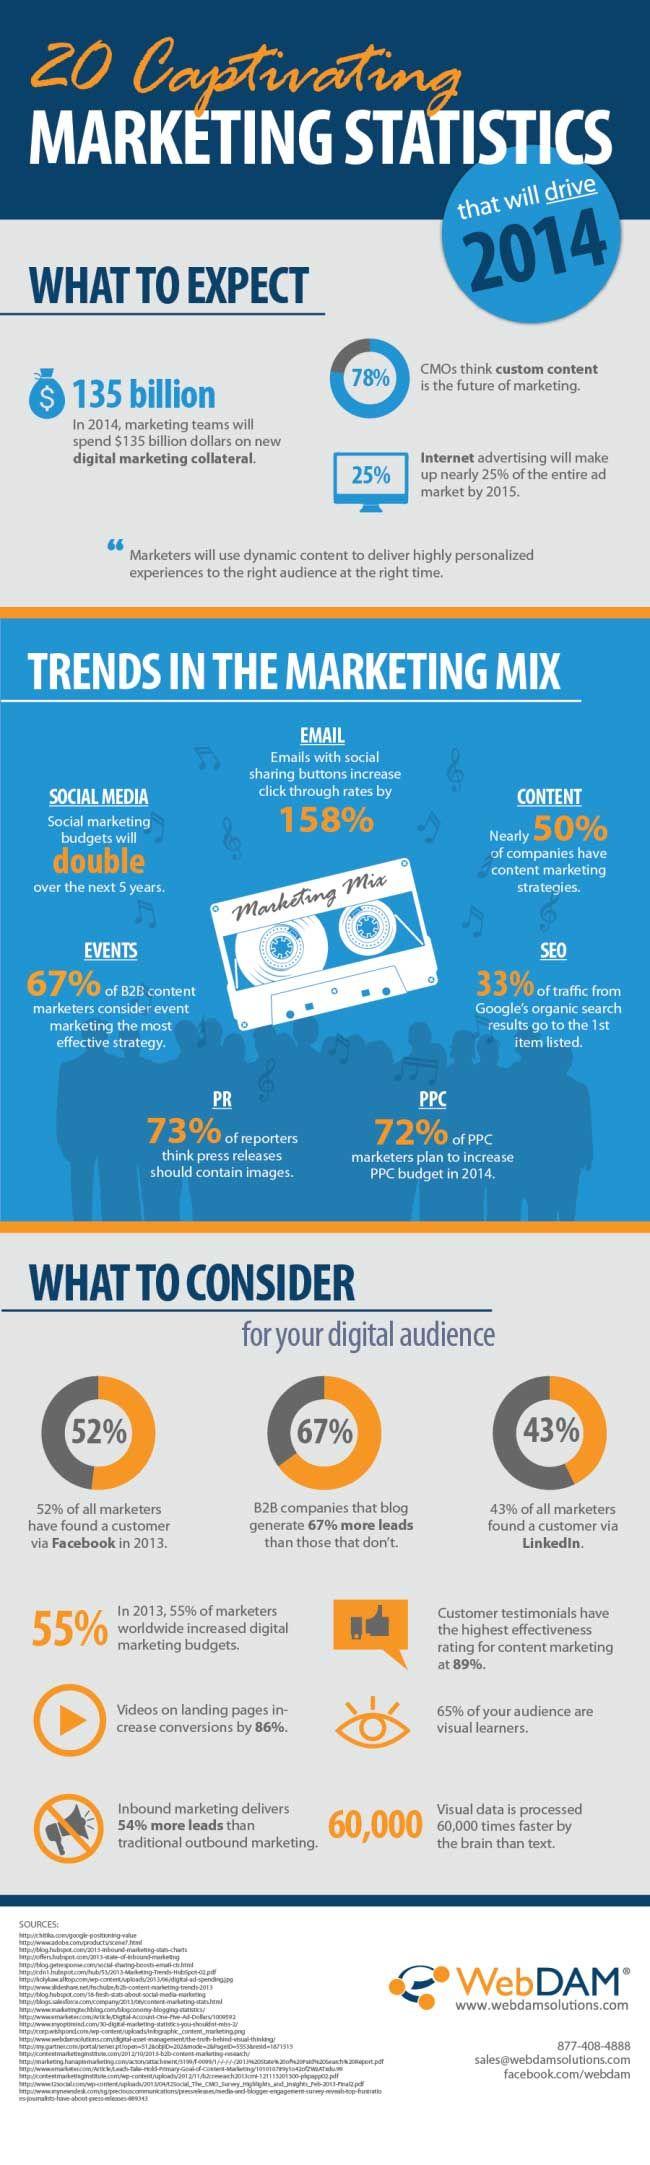 20 Amazing Marketing Statistics That Will Drive 2014 (Infographic)